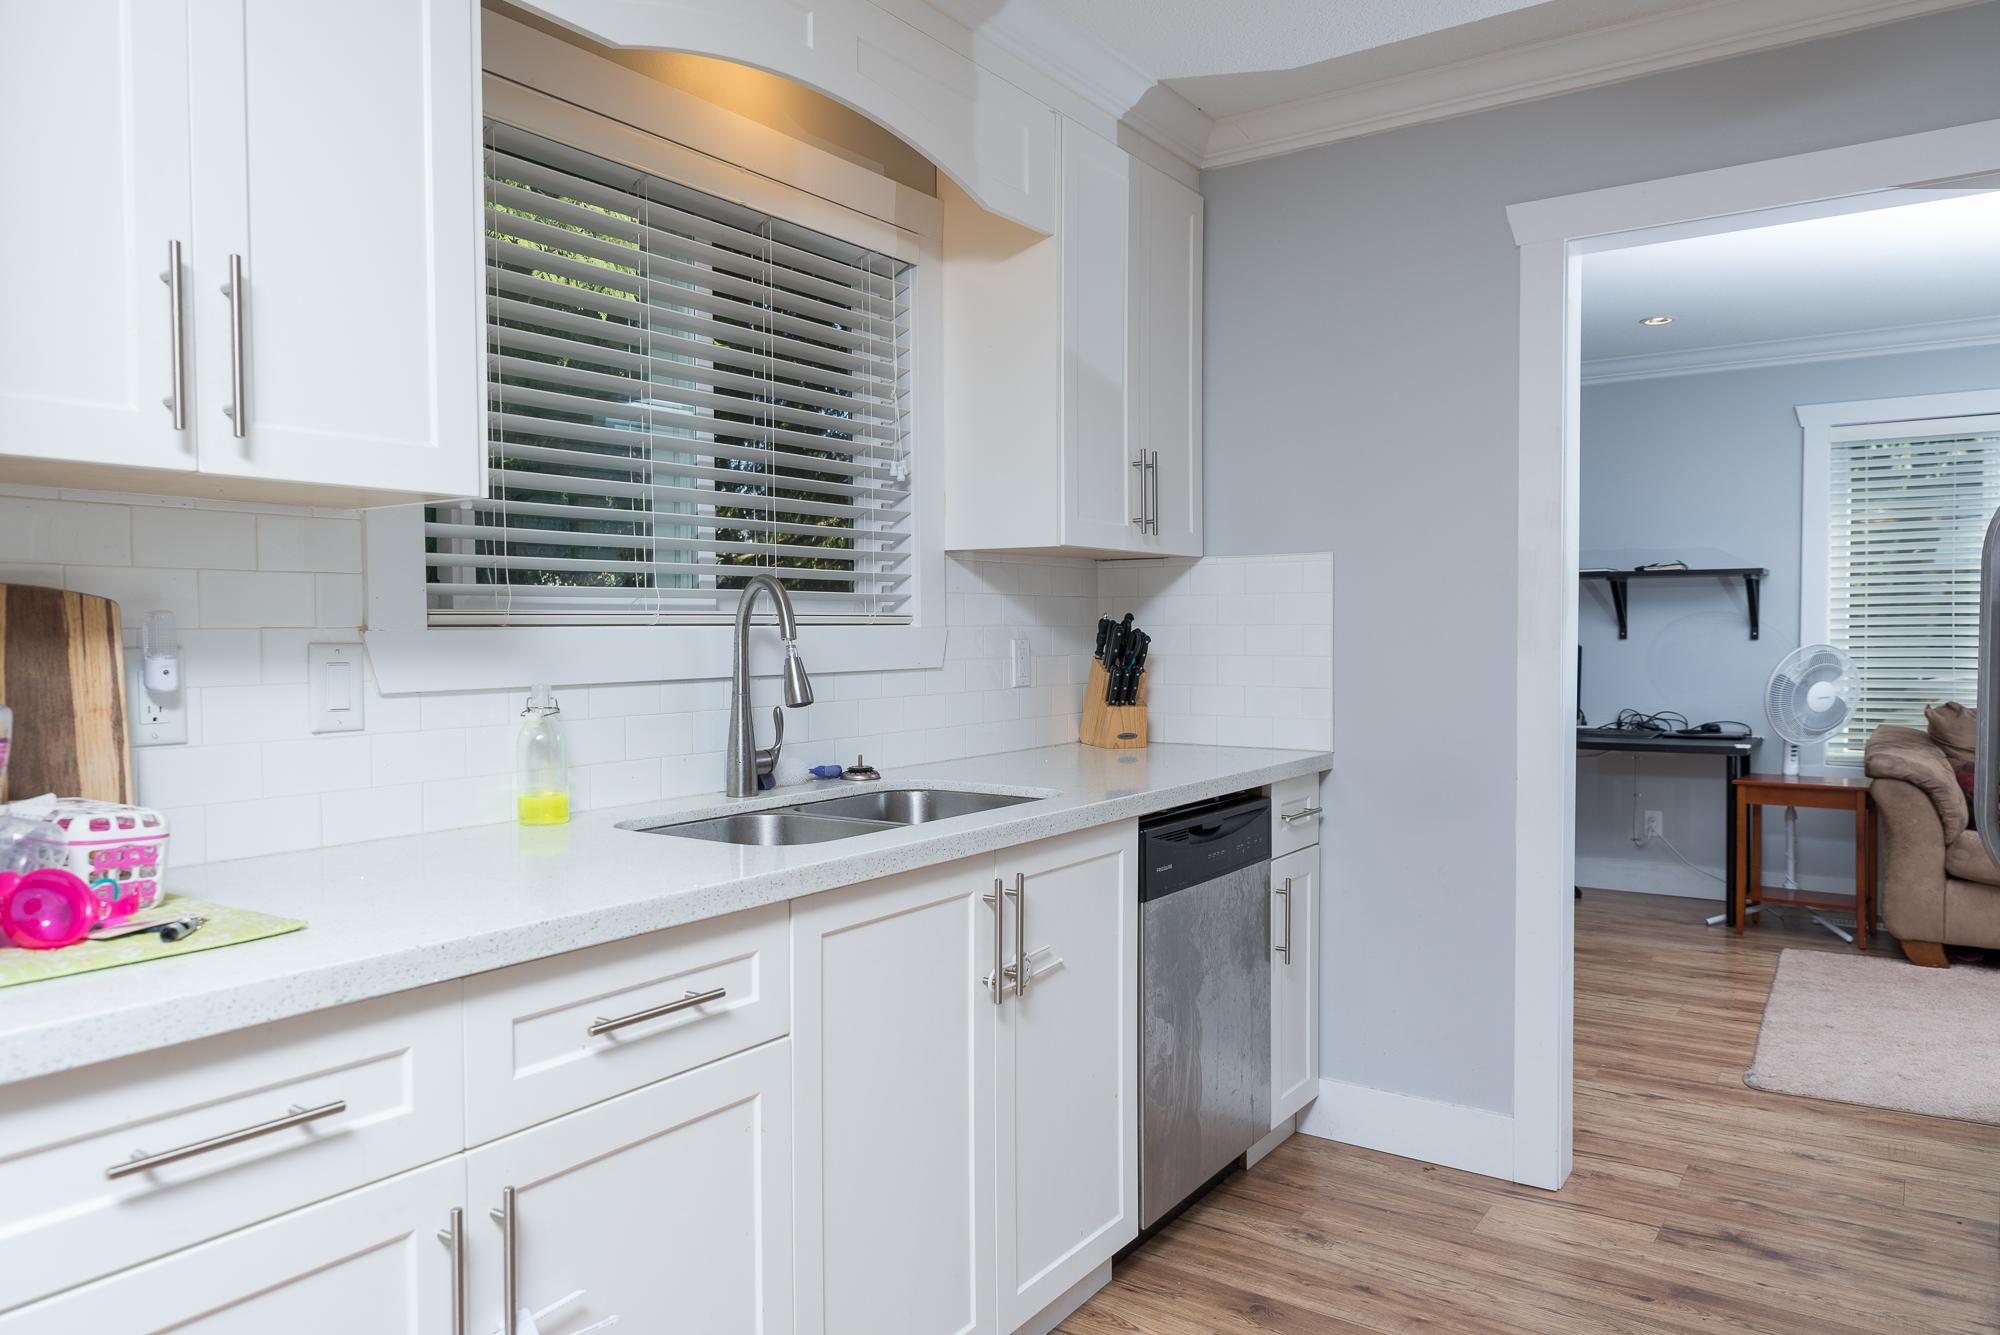 33419 George Ferguson Way, Abbotsford - Ochitwa Real Estate